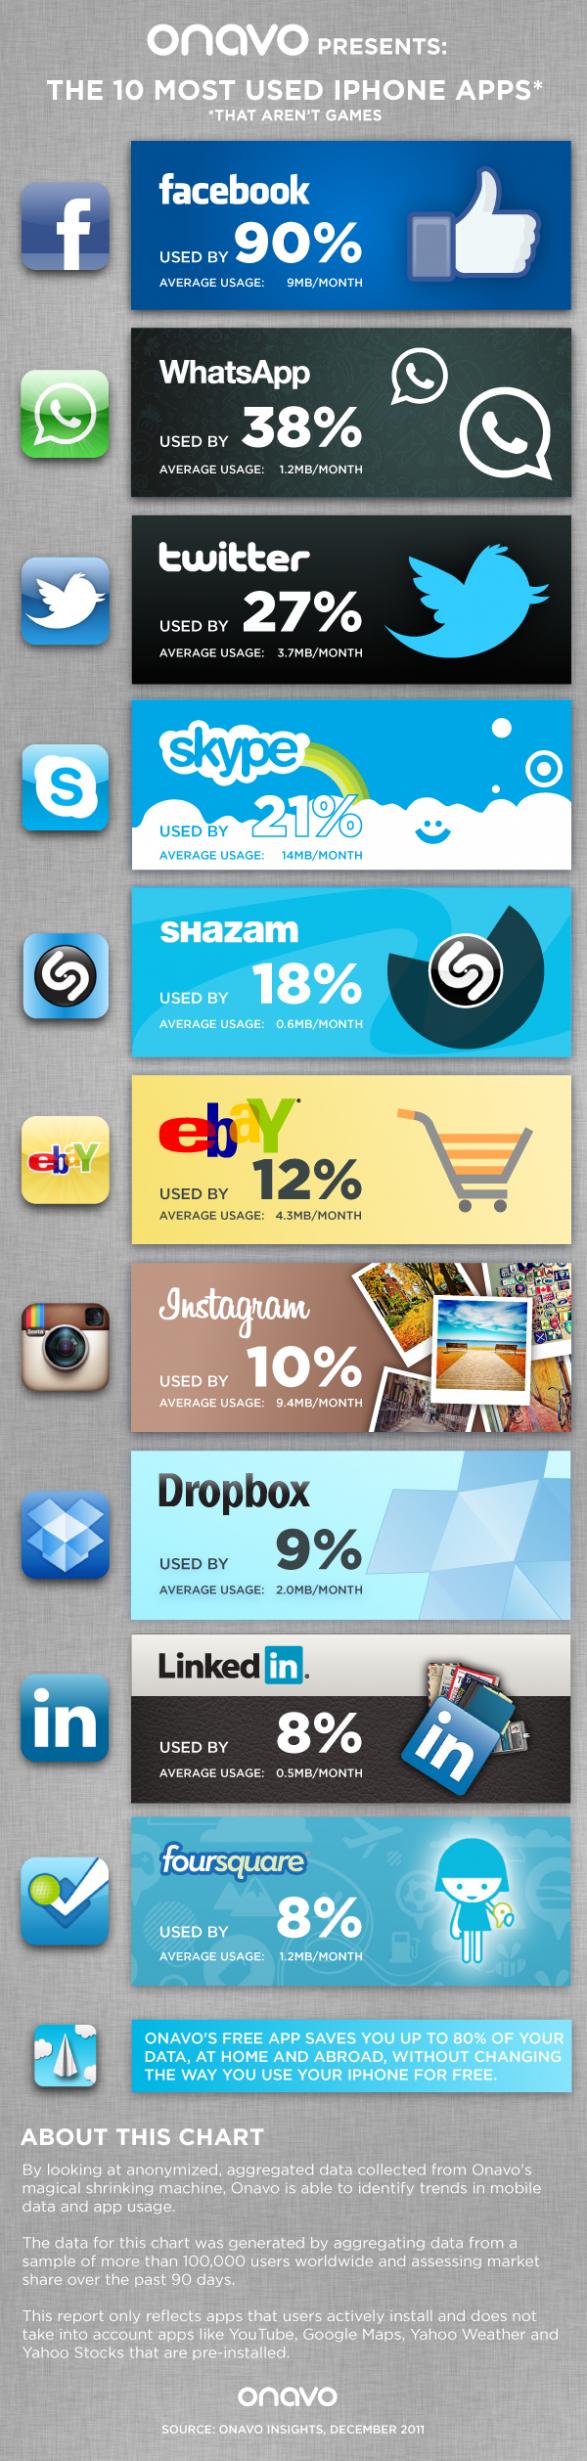 Top10MostUsediPhoneApps 4ee5f954bdeb1 w587